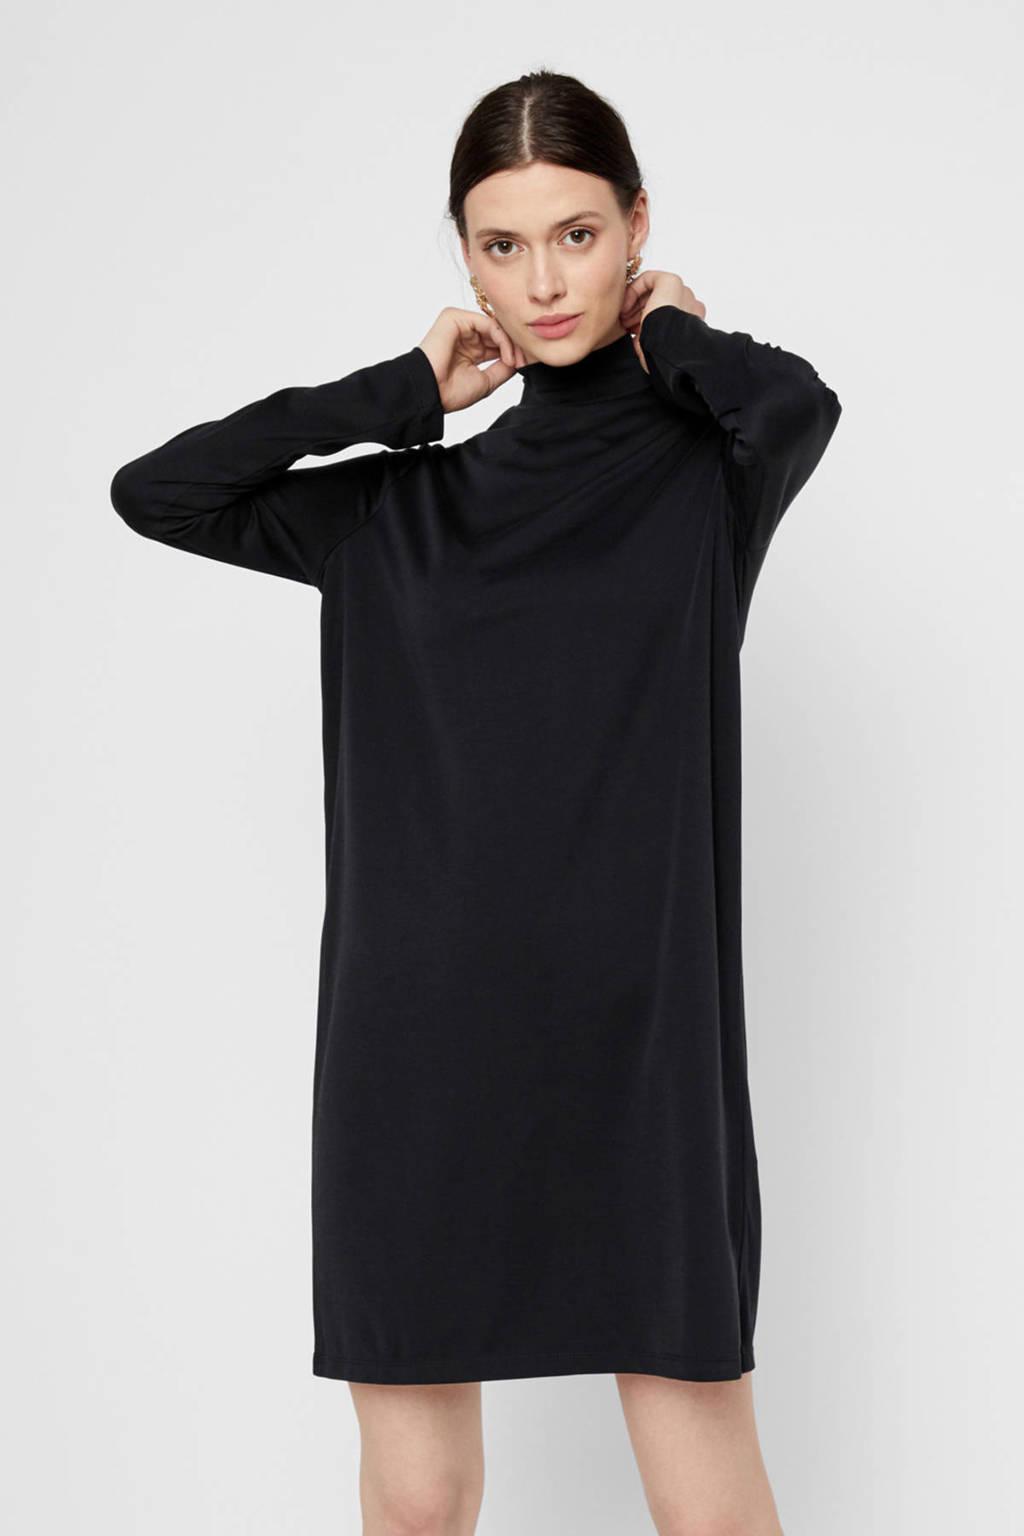 PIECES gebreide jurk zwart, Zwart